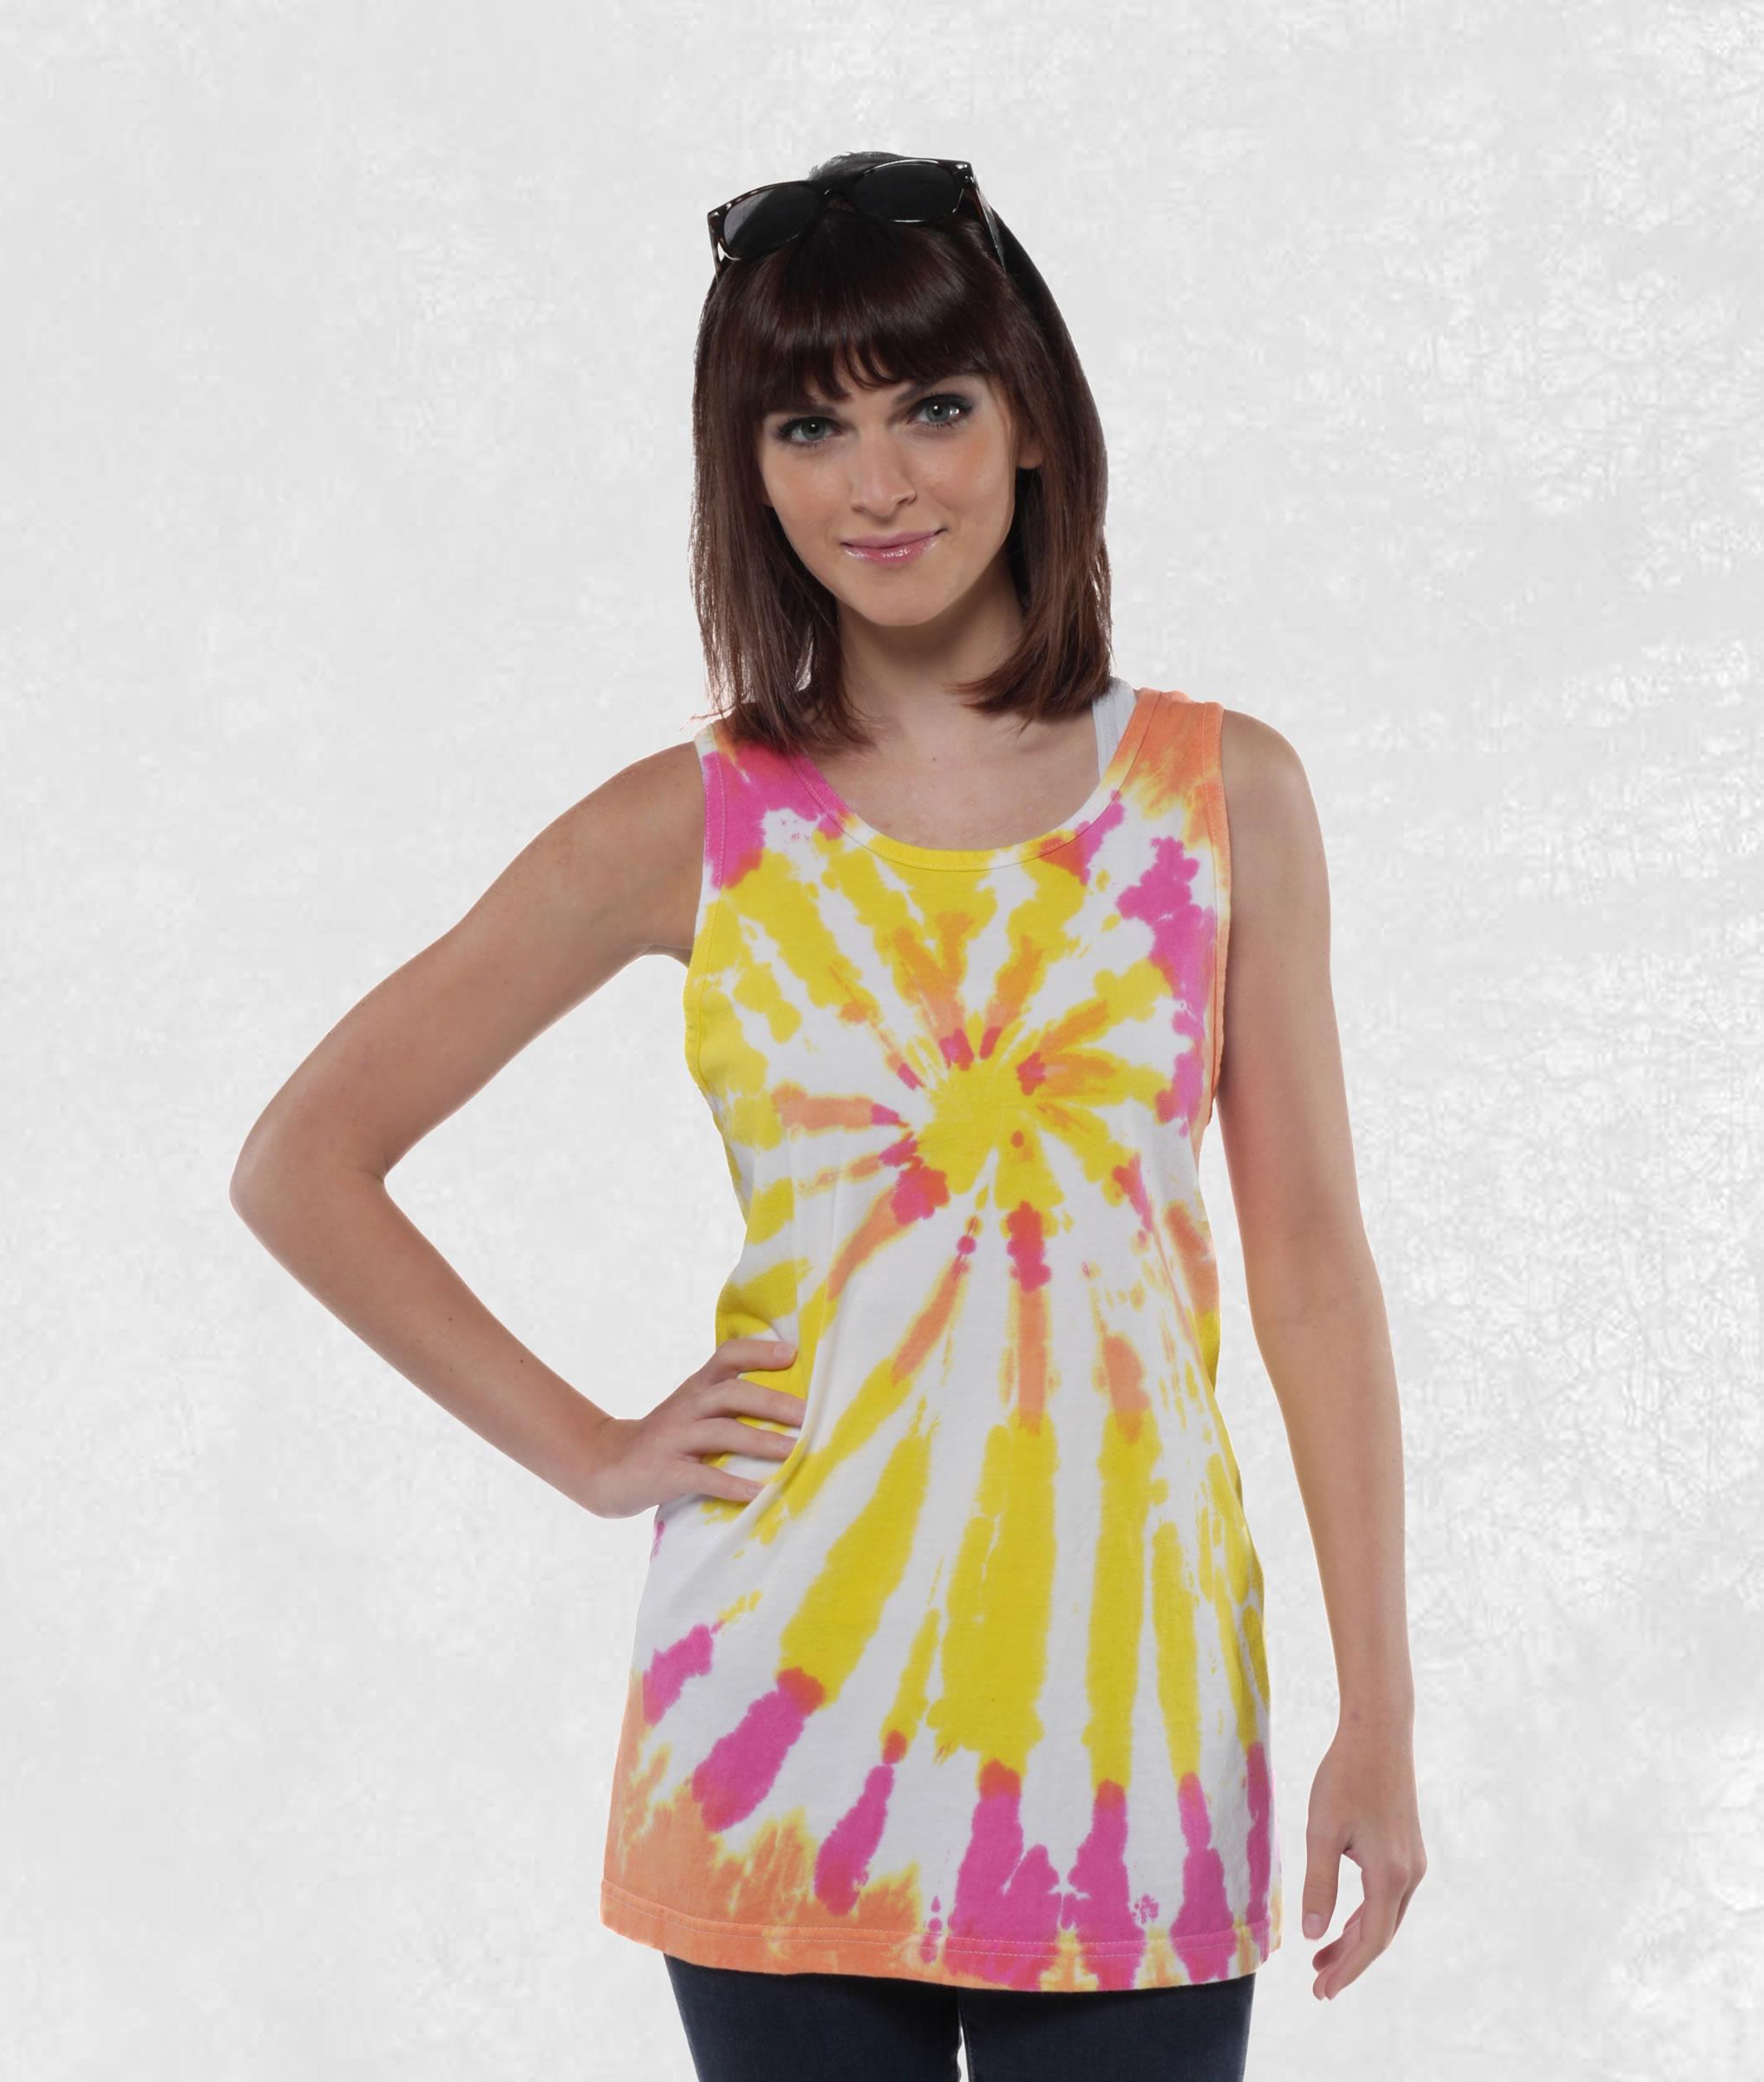 Neon Summer Sunset Tie Dye Tank Top